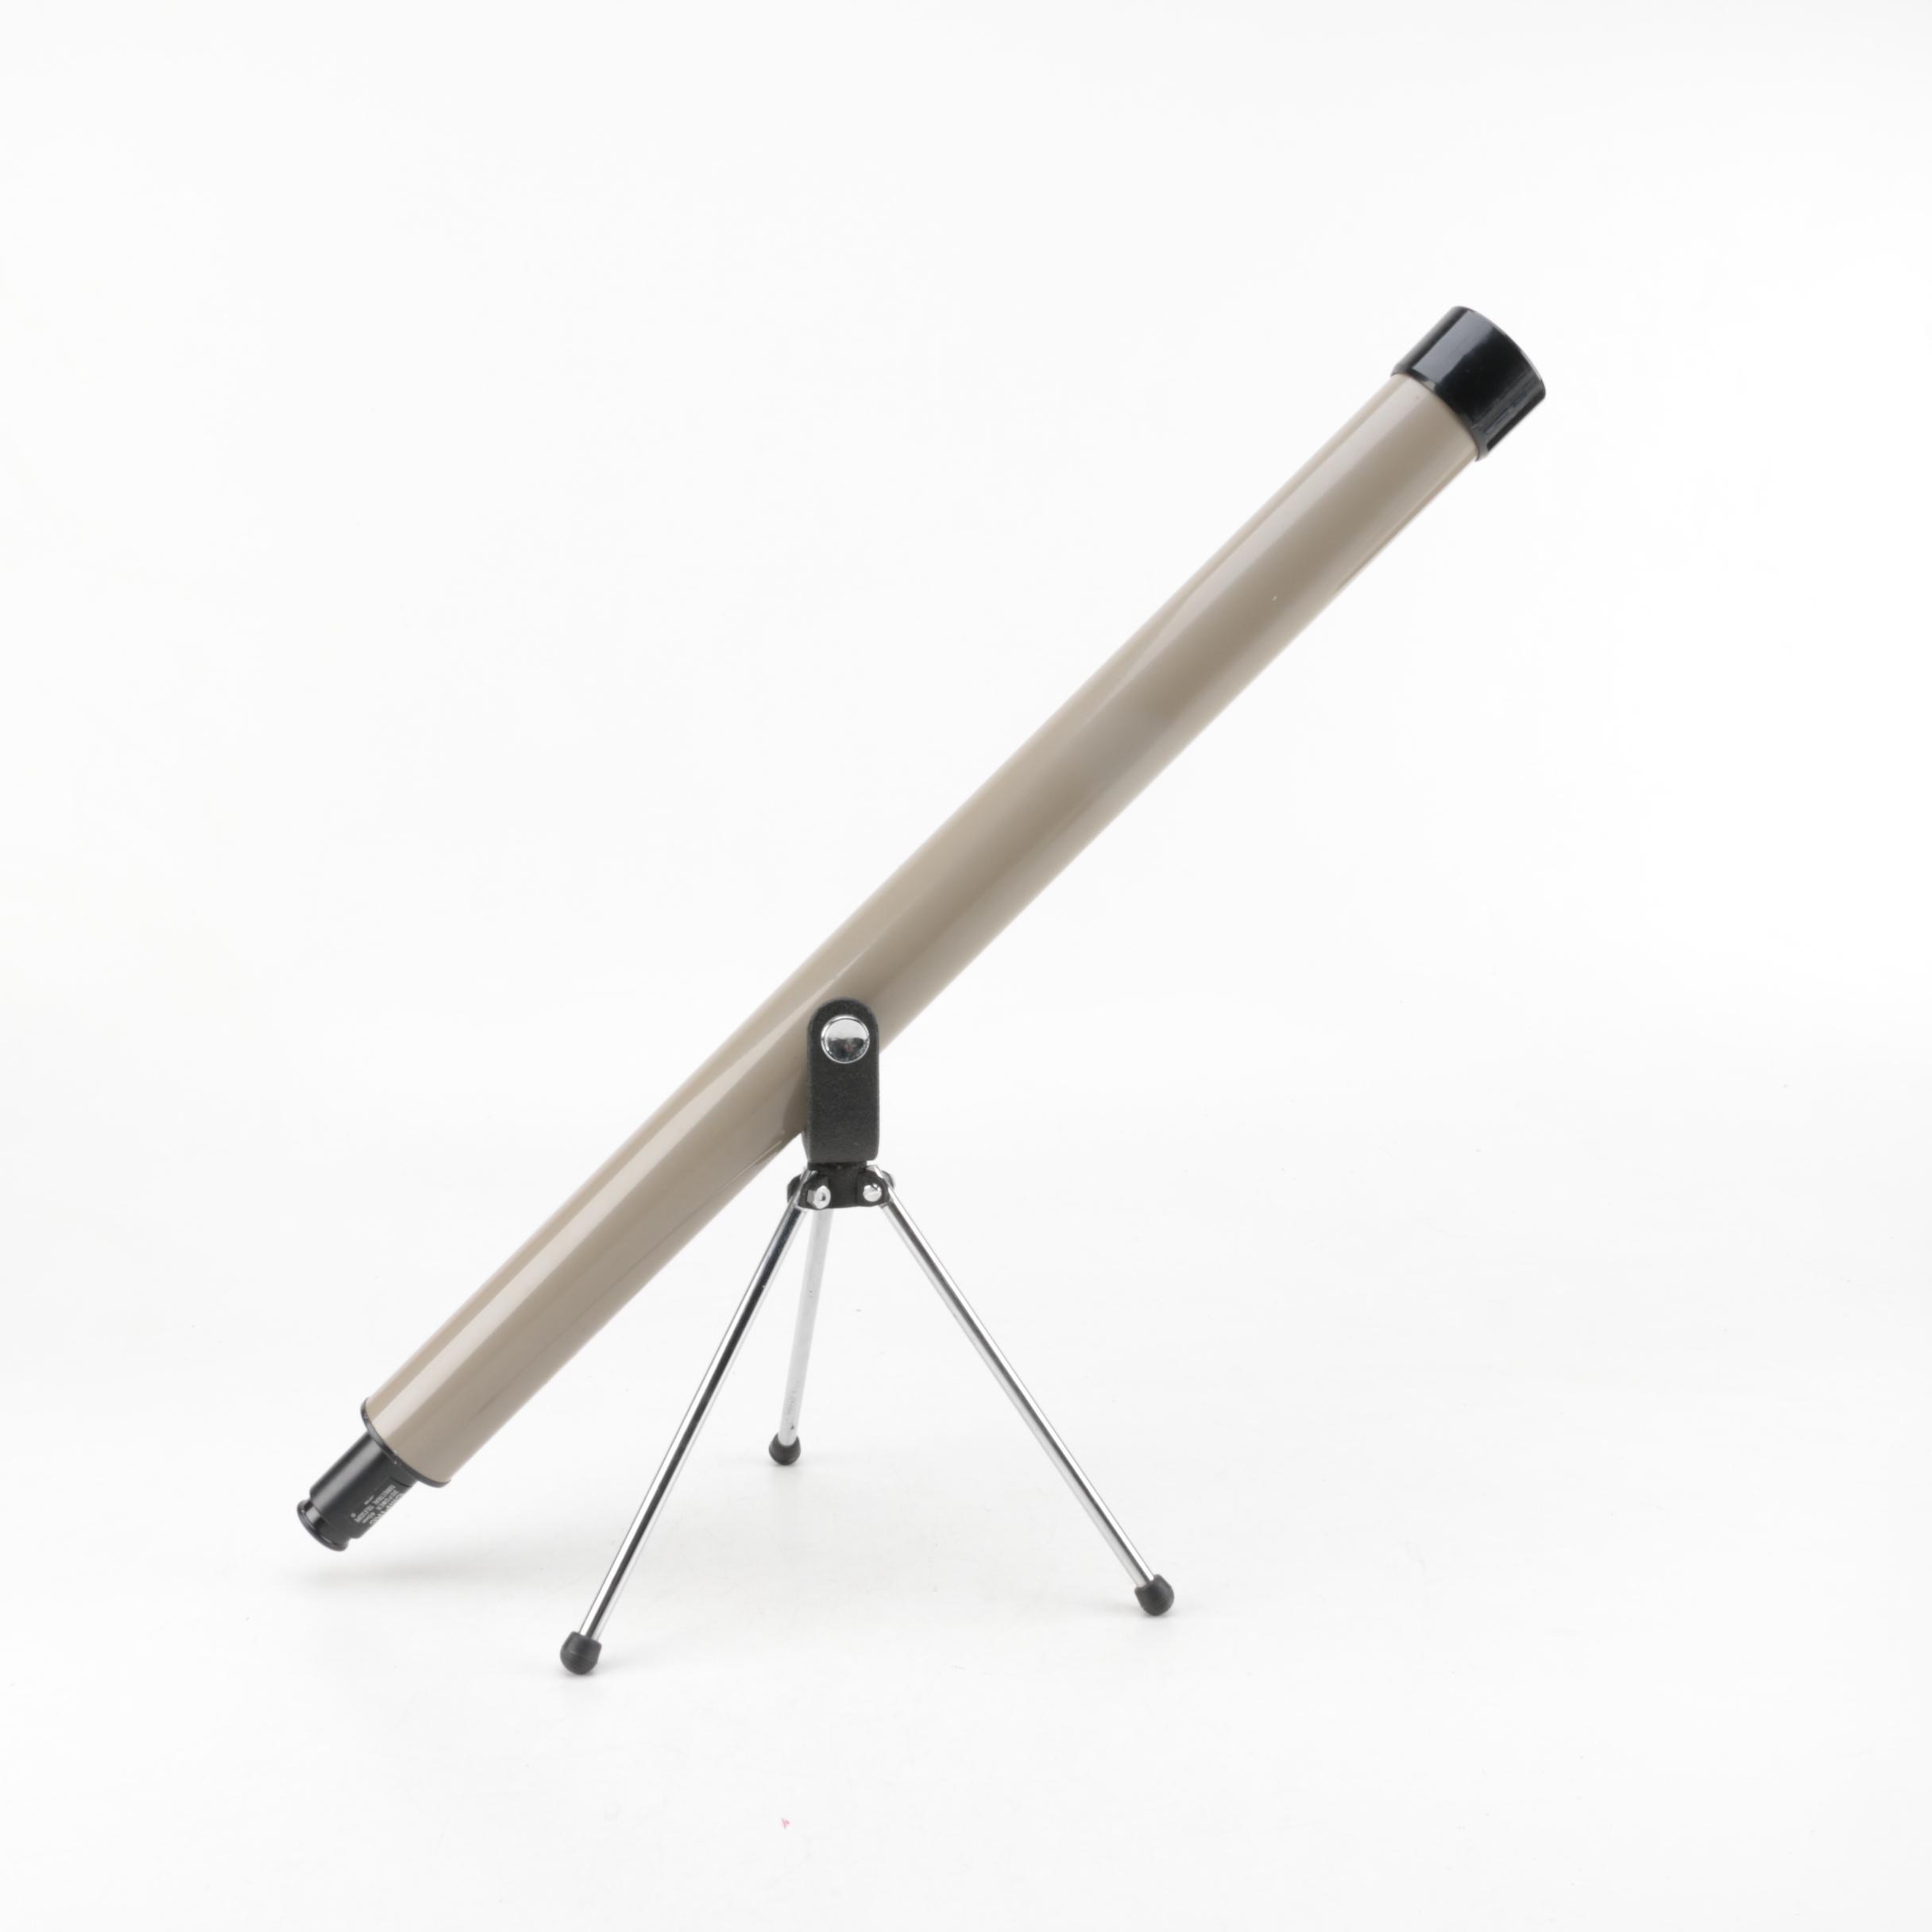 Vintage Empire Terrestrial Telescope